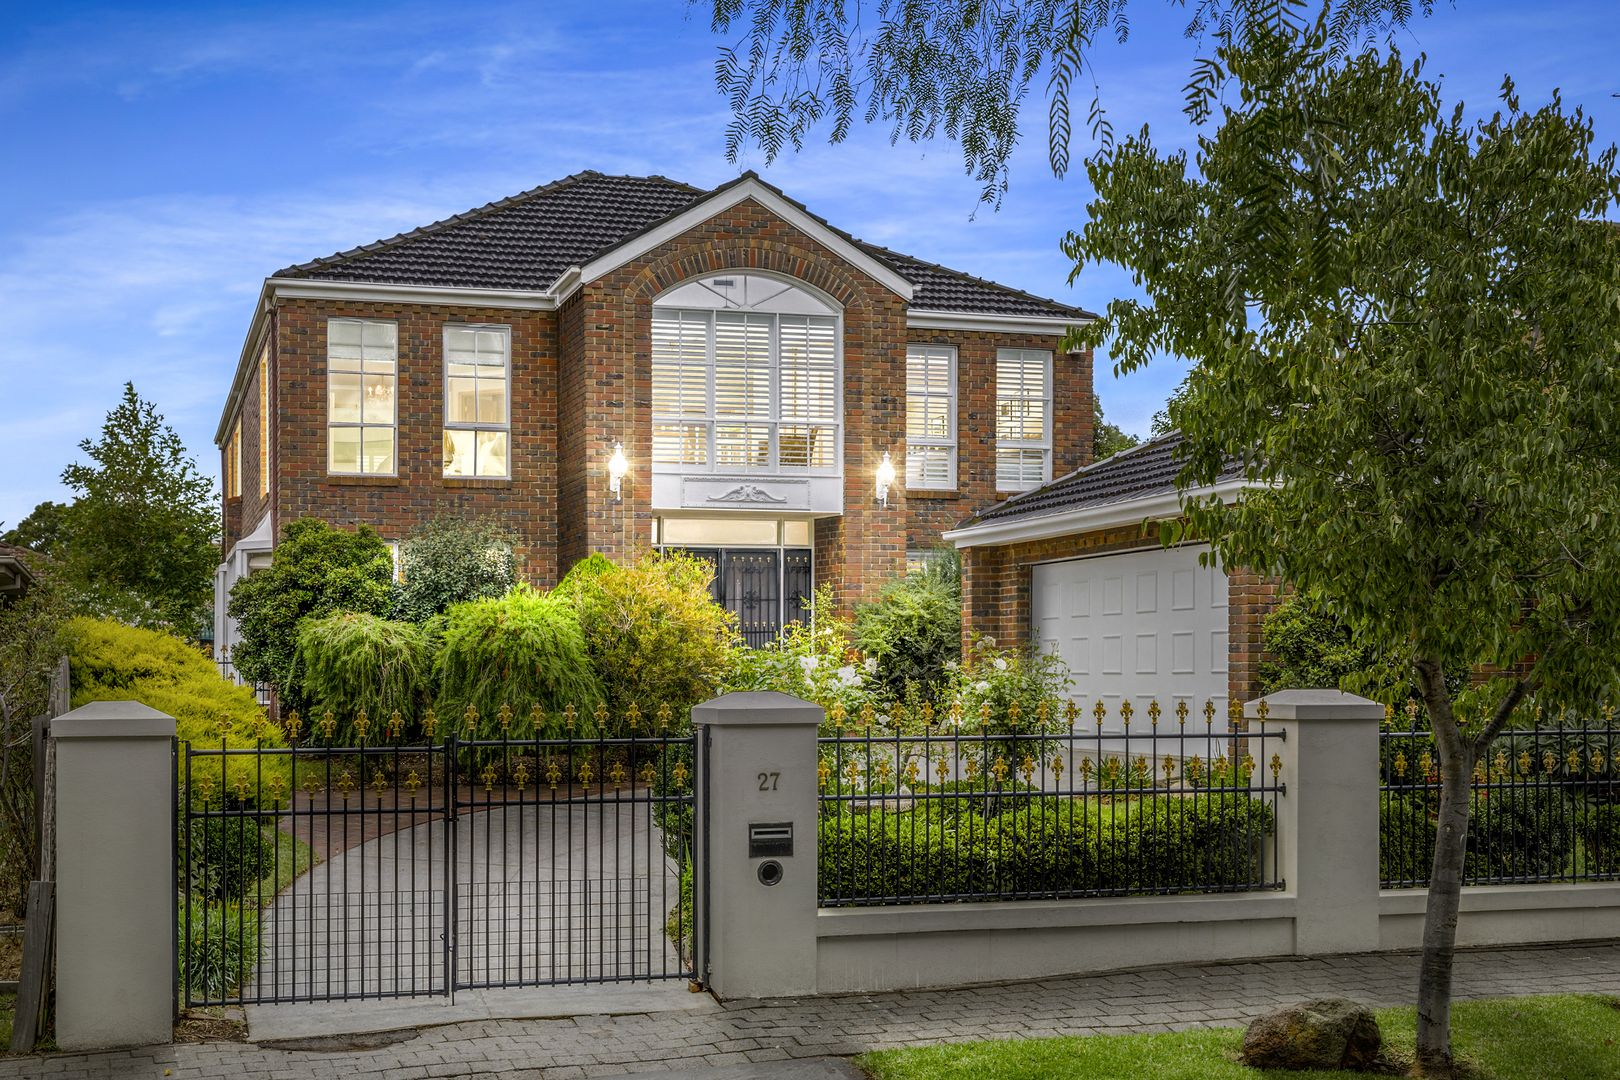 27 Ballarat Road, Footscray VIC 3011, Image 0